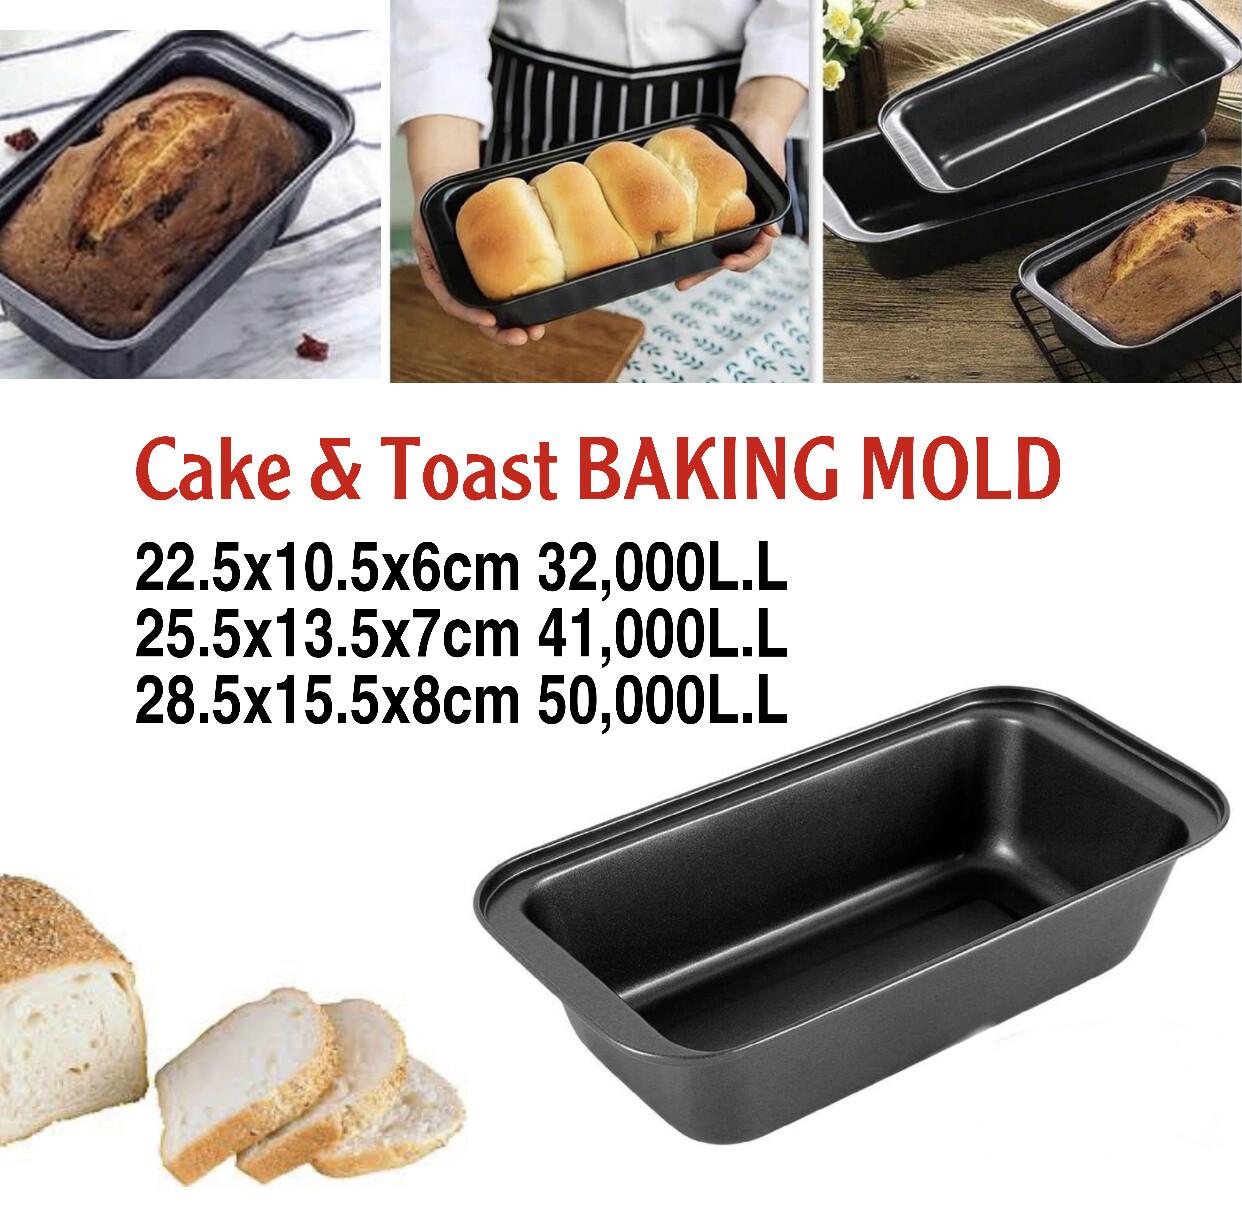 Cake & Toast Mold